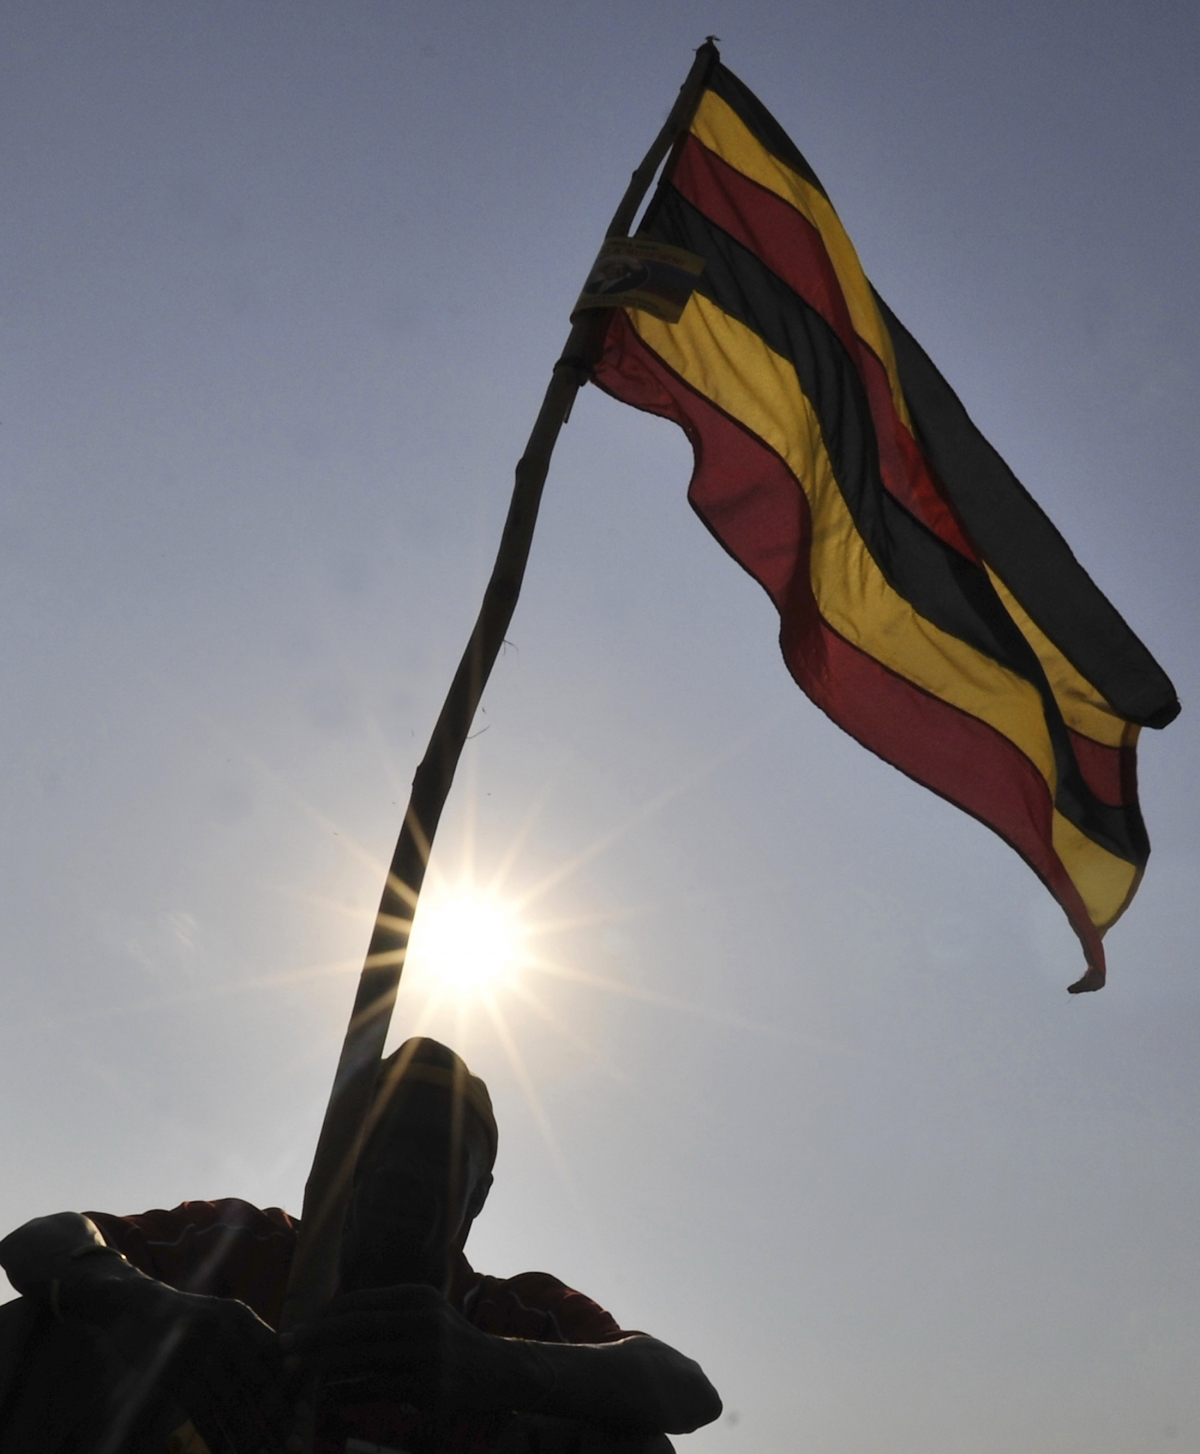 Uganda's flag